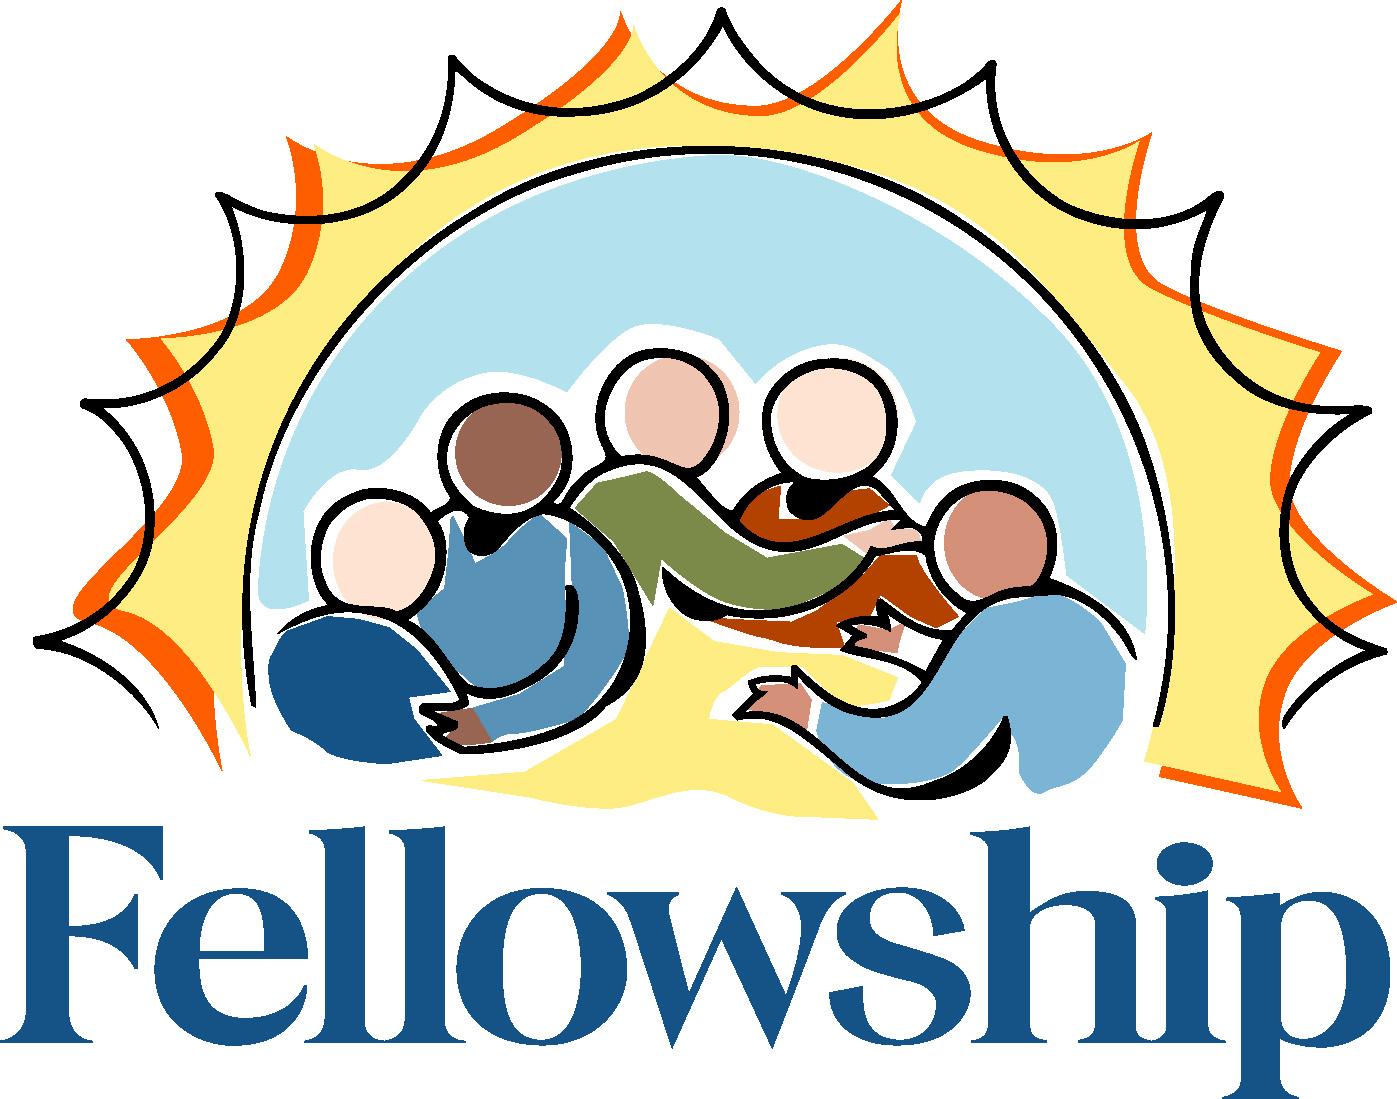 Fellowship Clipart.